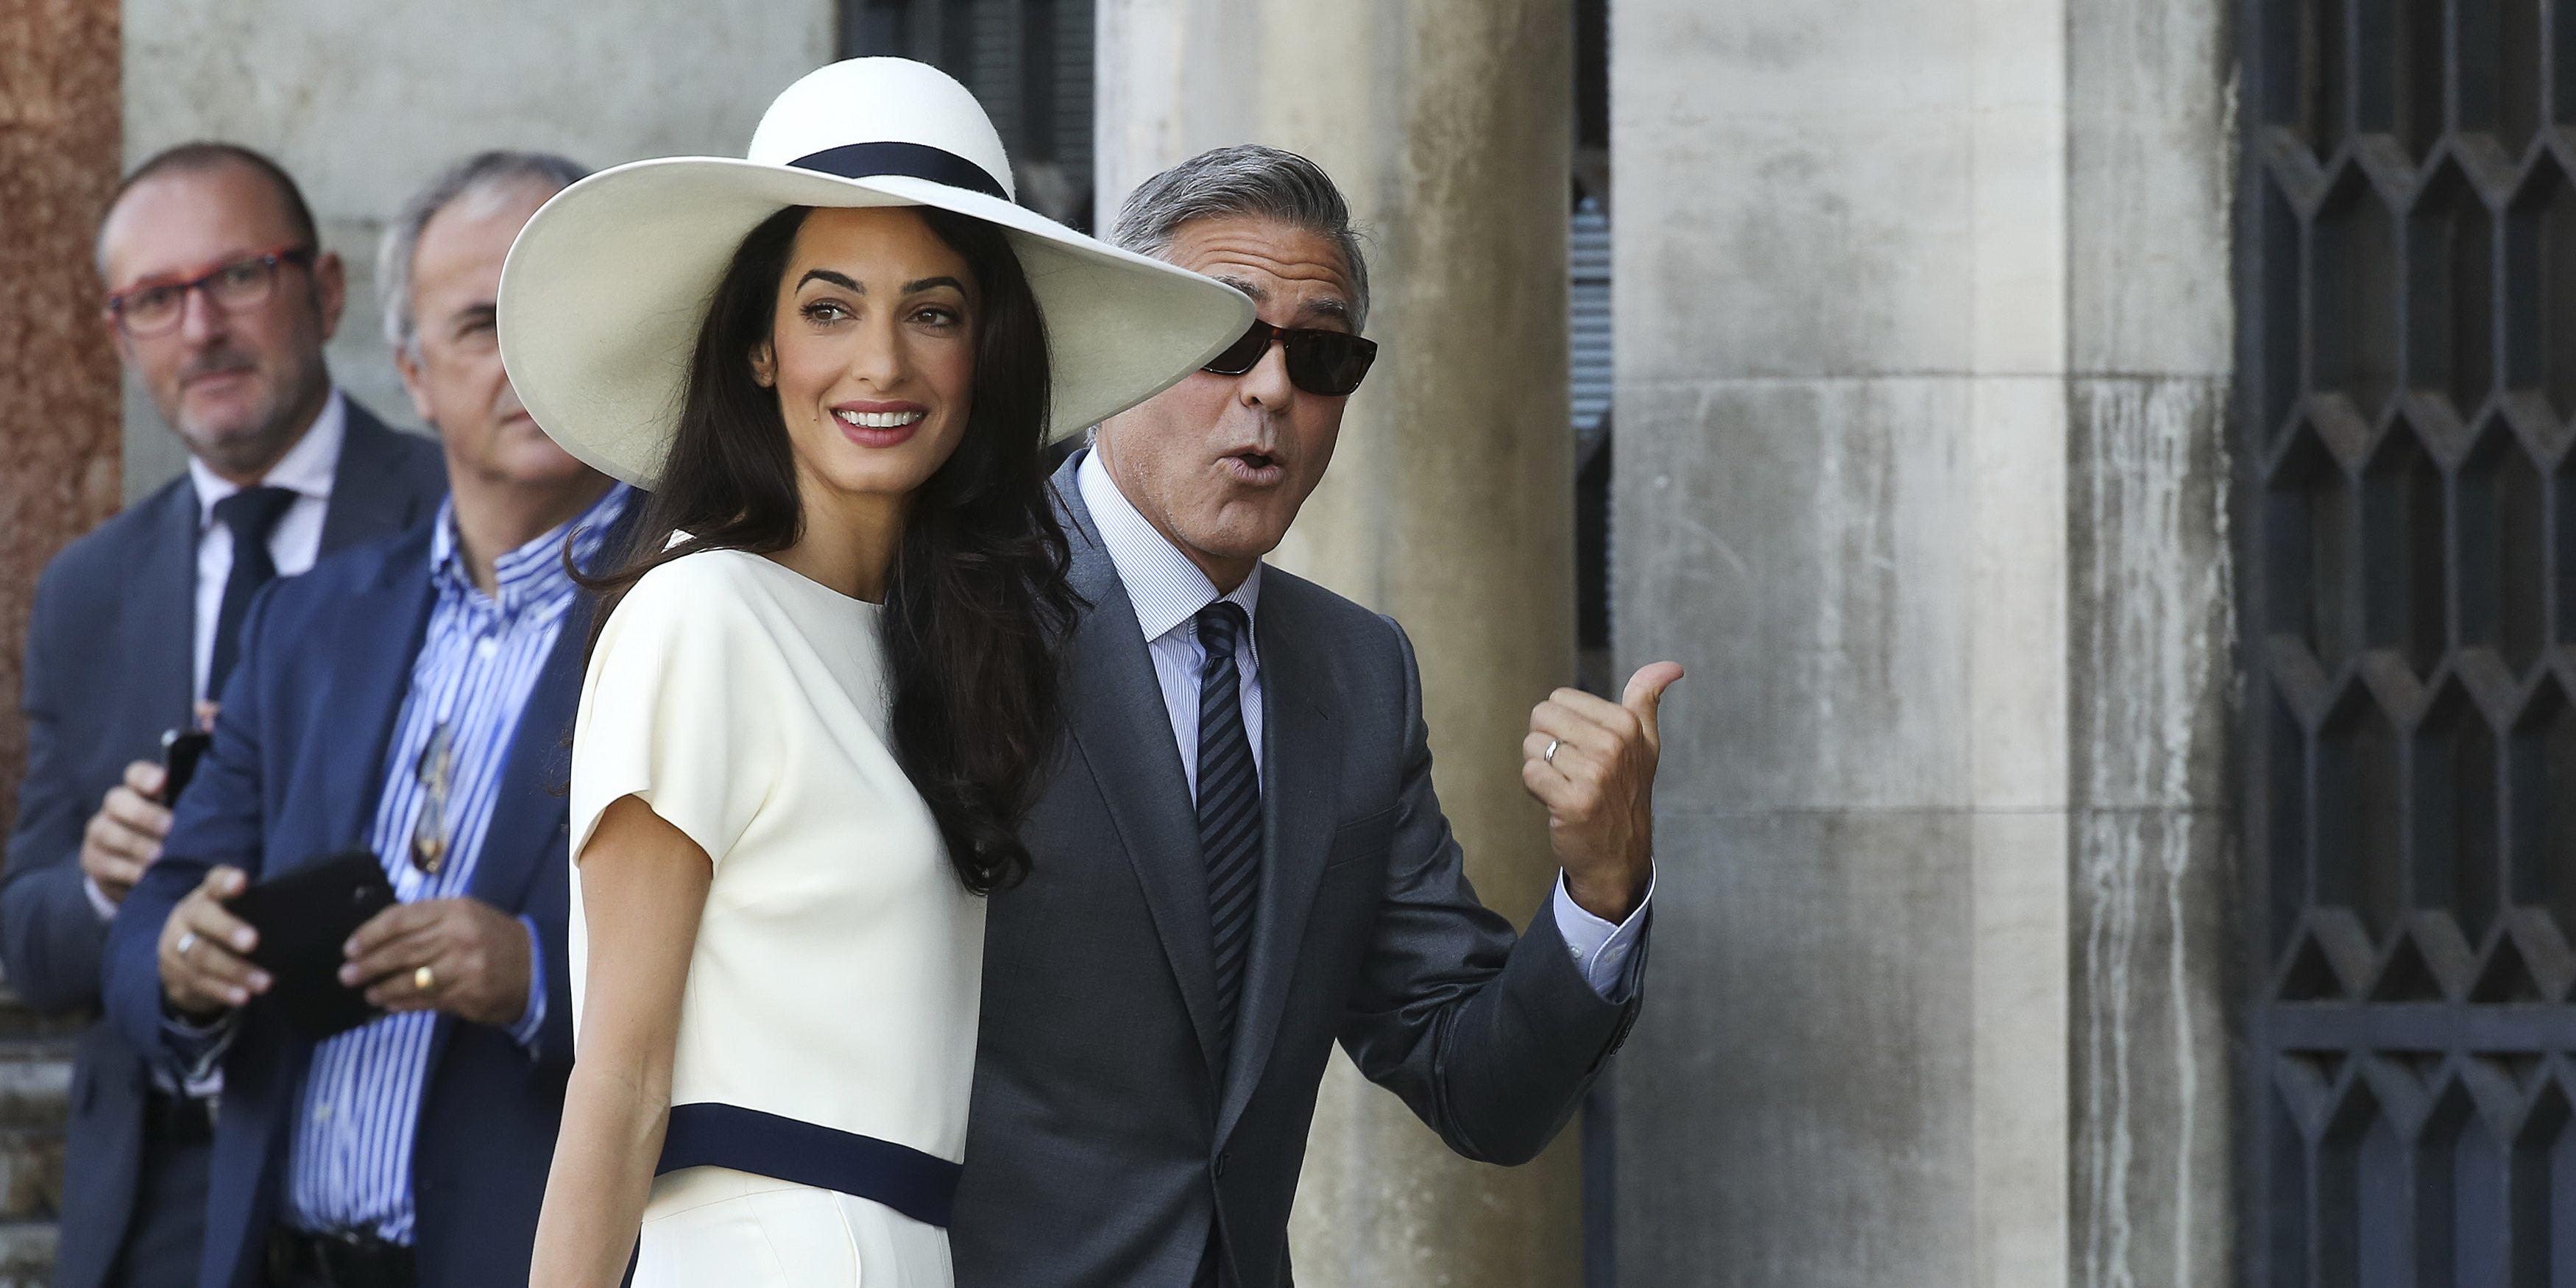 Amal Clooney Net Worth 2018: Wiki, Married, Family, Wedding